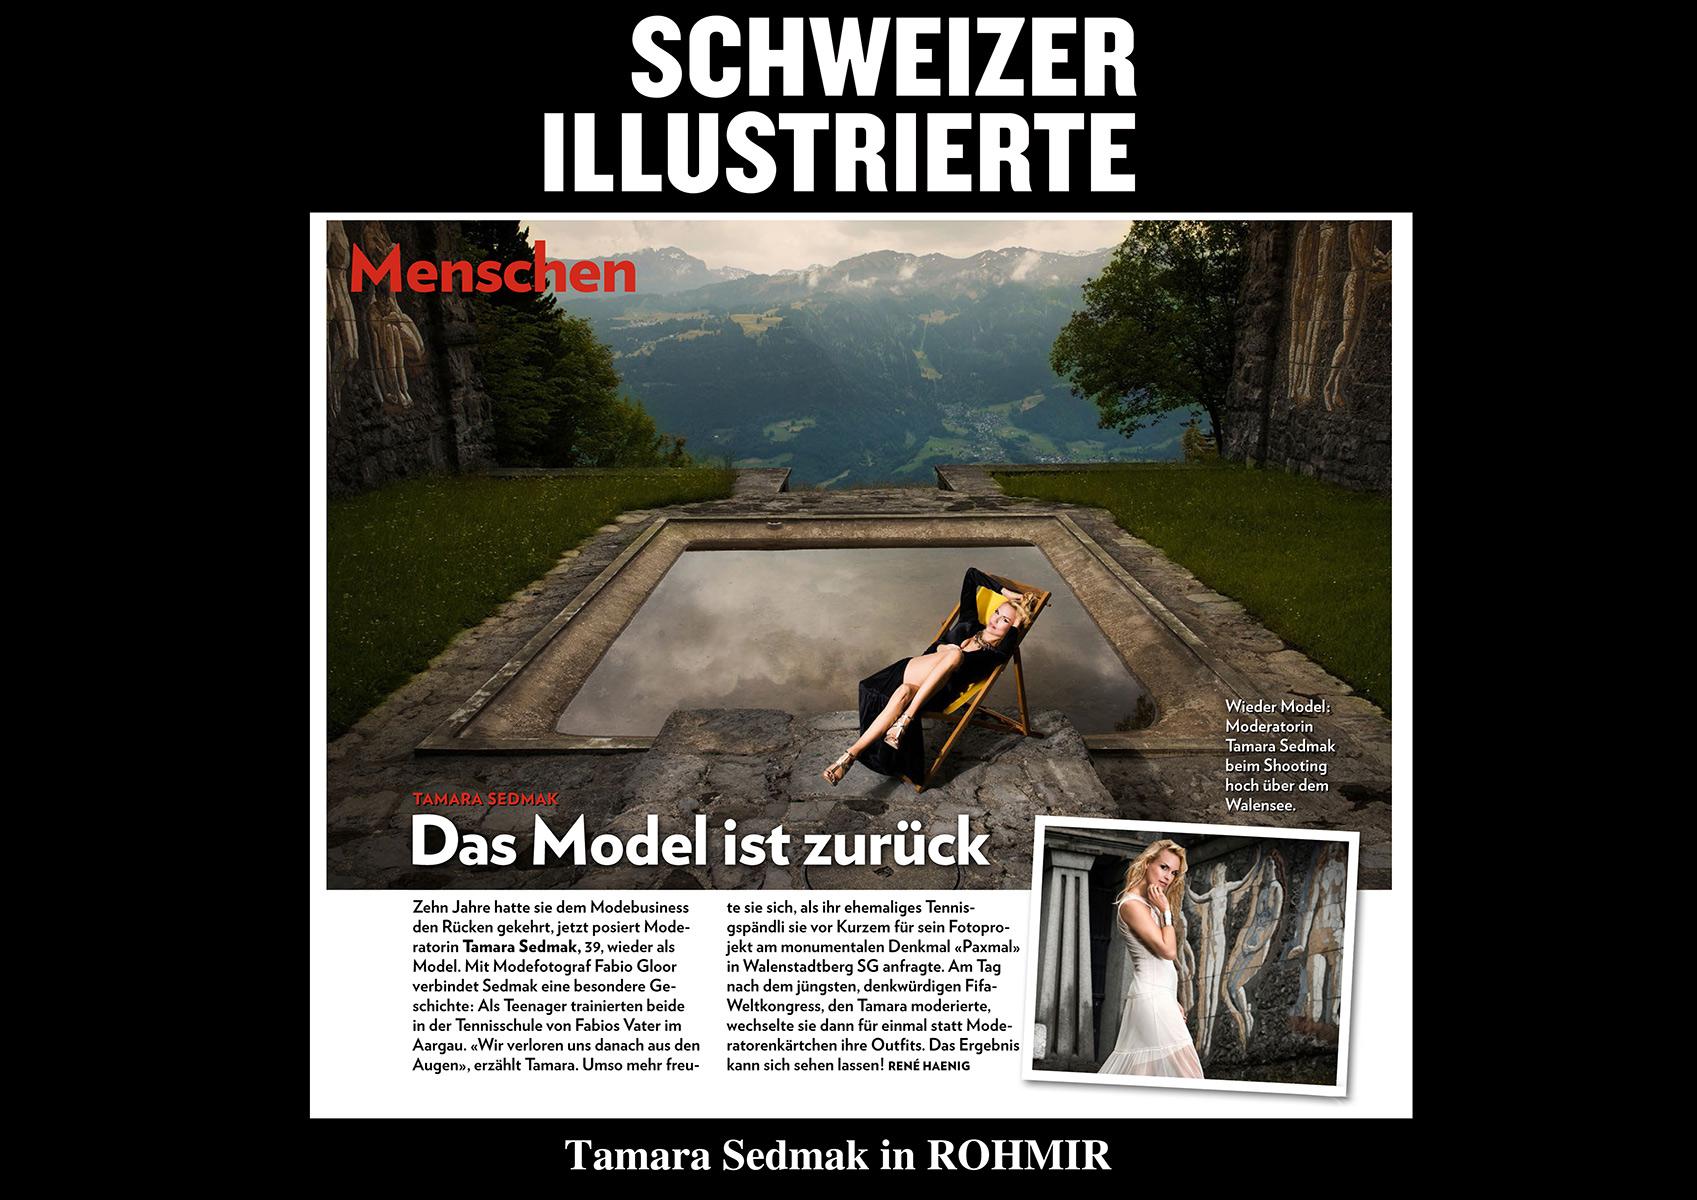 Tamara-Sedmak-in-ROHMIR